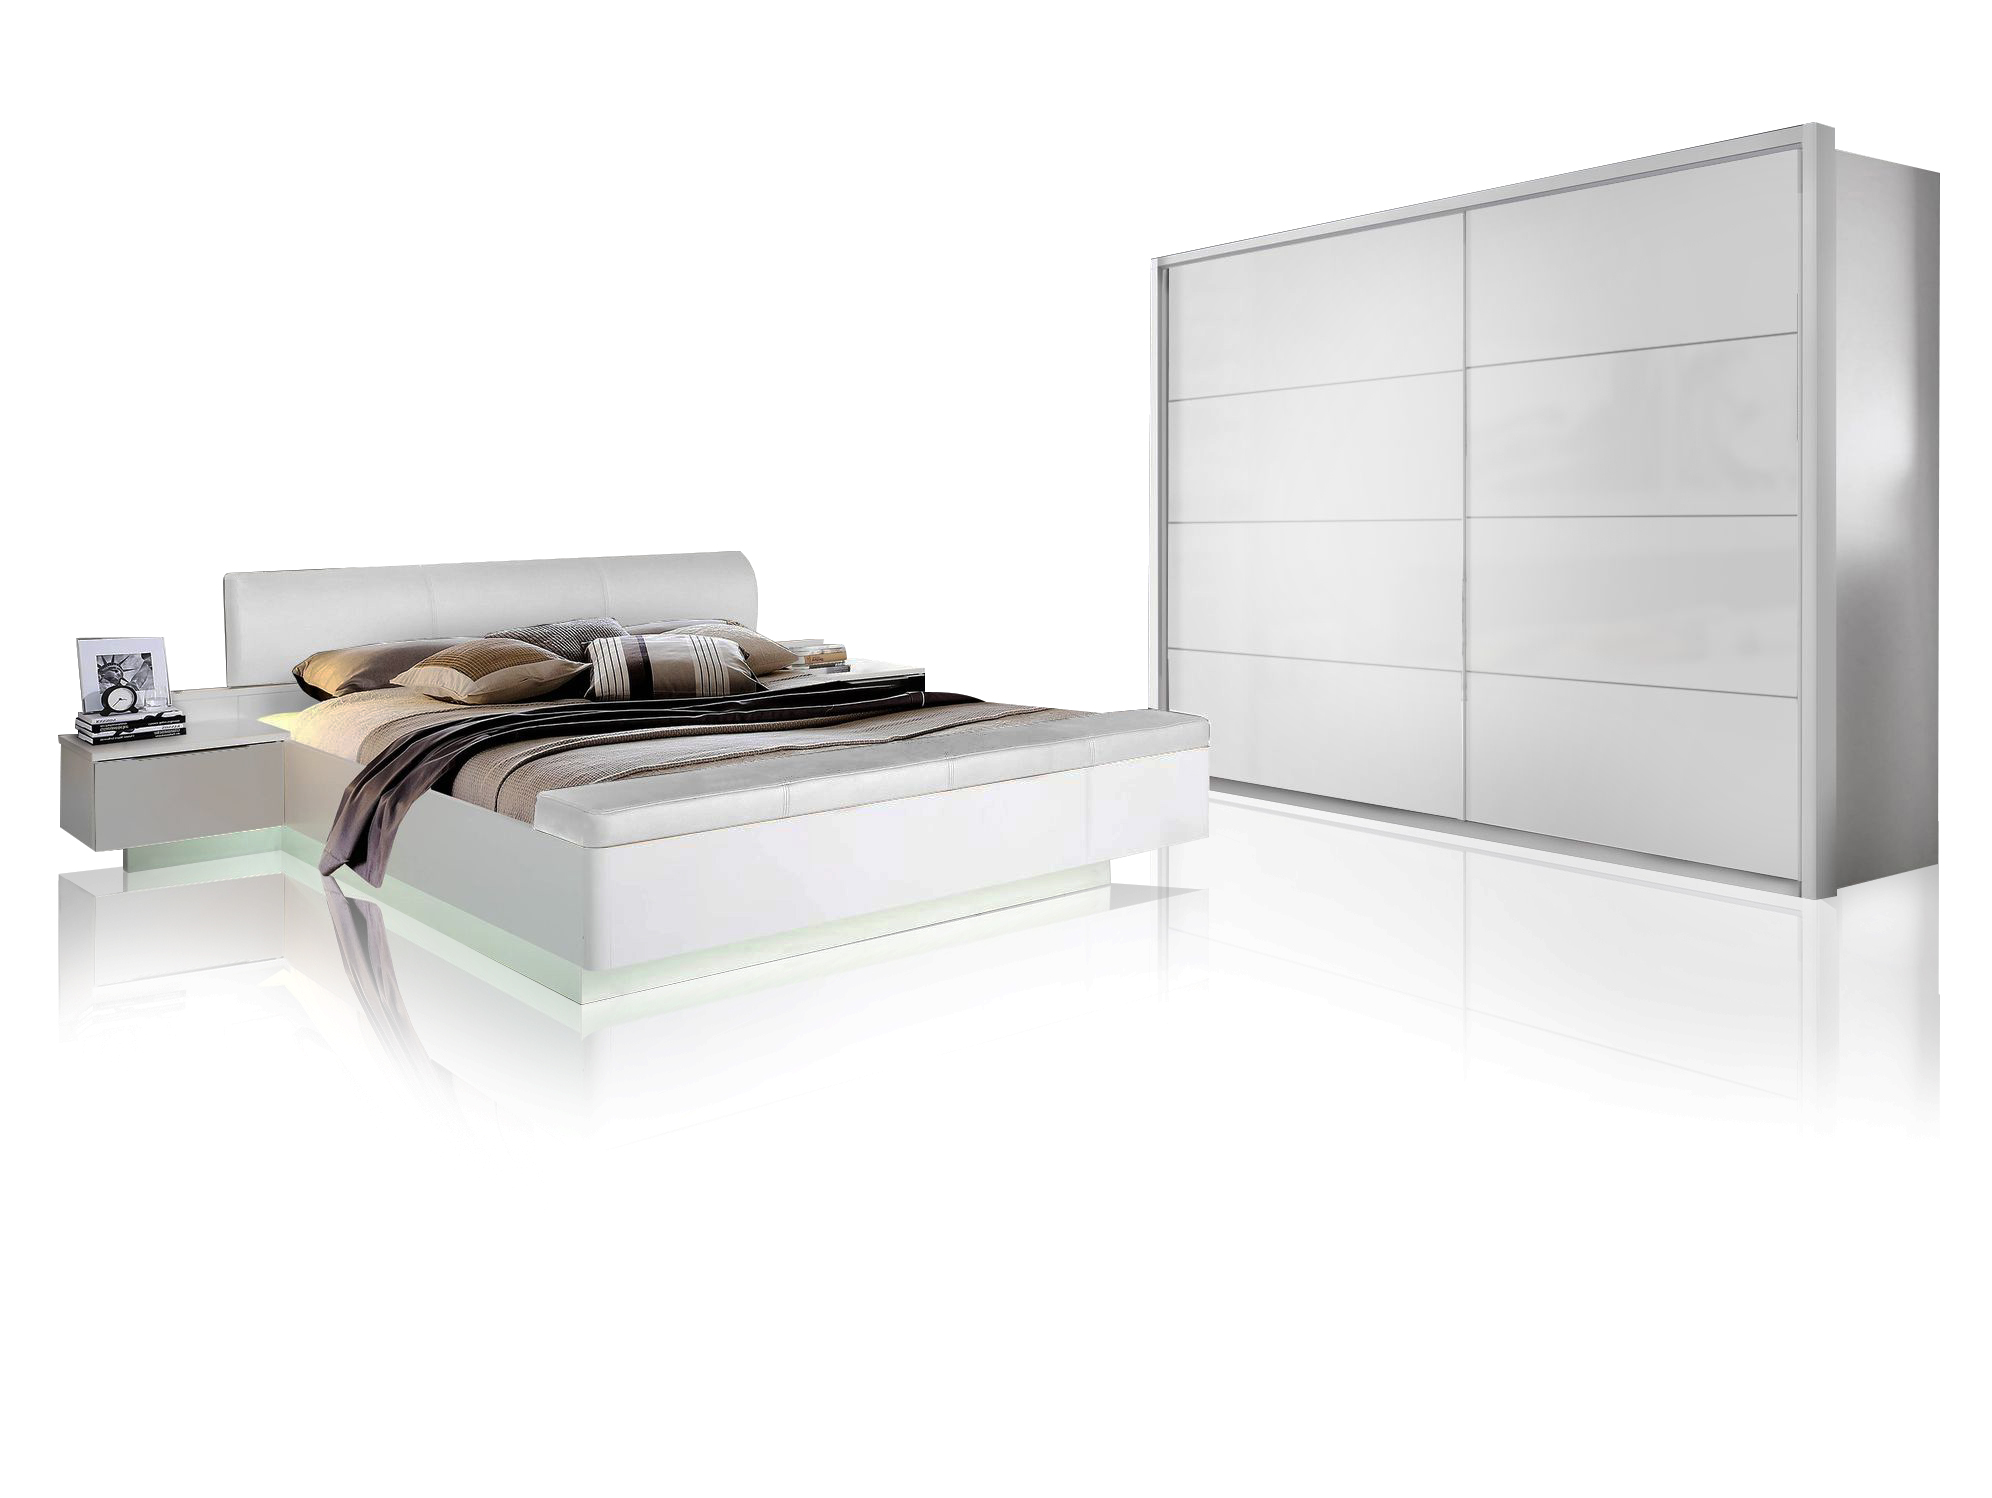 SILENT Komplett-Schlafzimmer, Material Dekorspanplatte ...